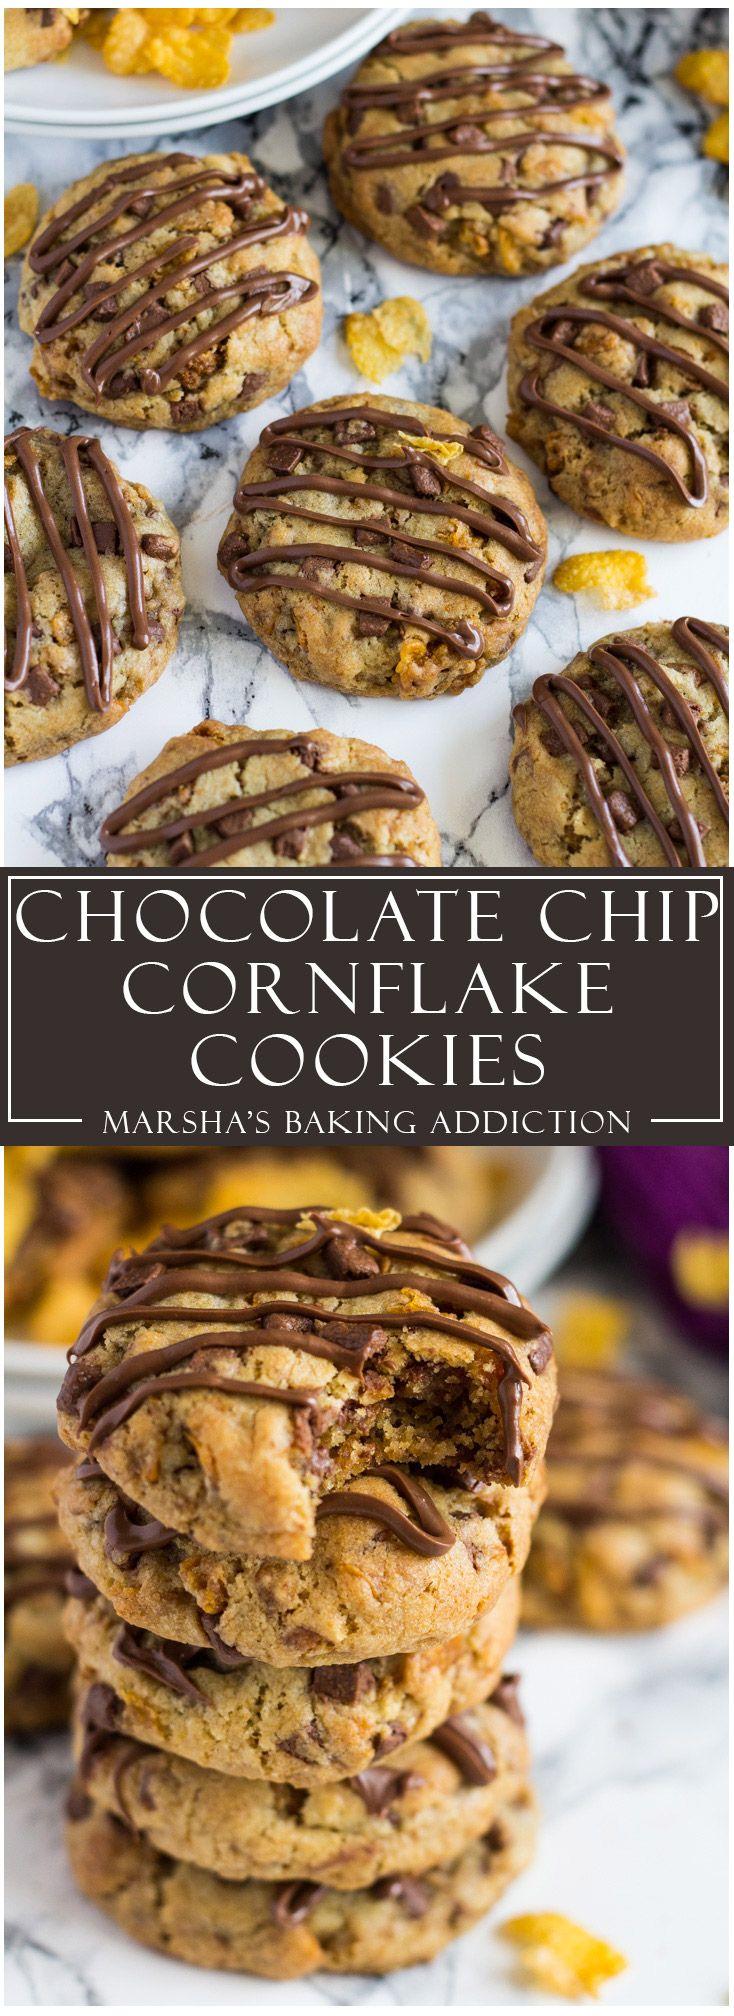 Chocolate Chip Cornflake Cookies | marshasbakingaddi... @Marsha's Baking Addiction